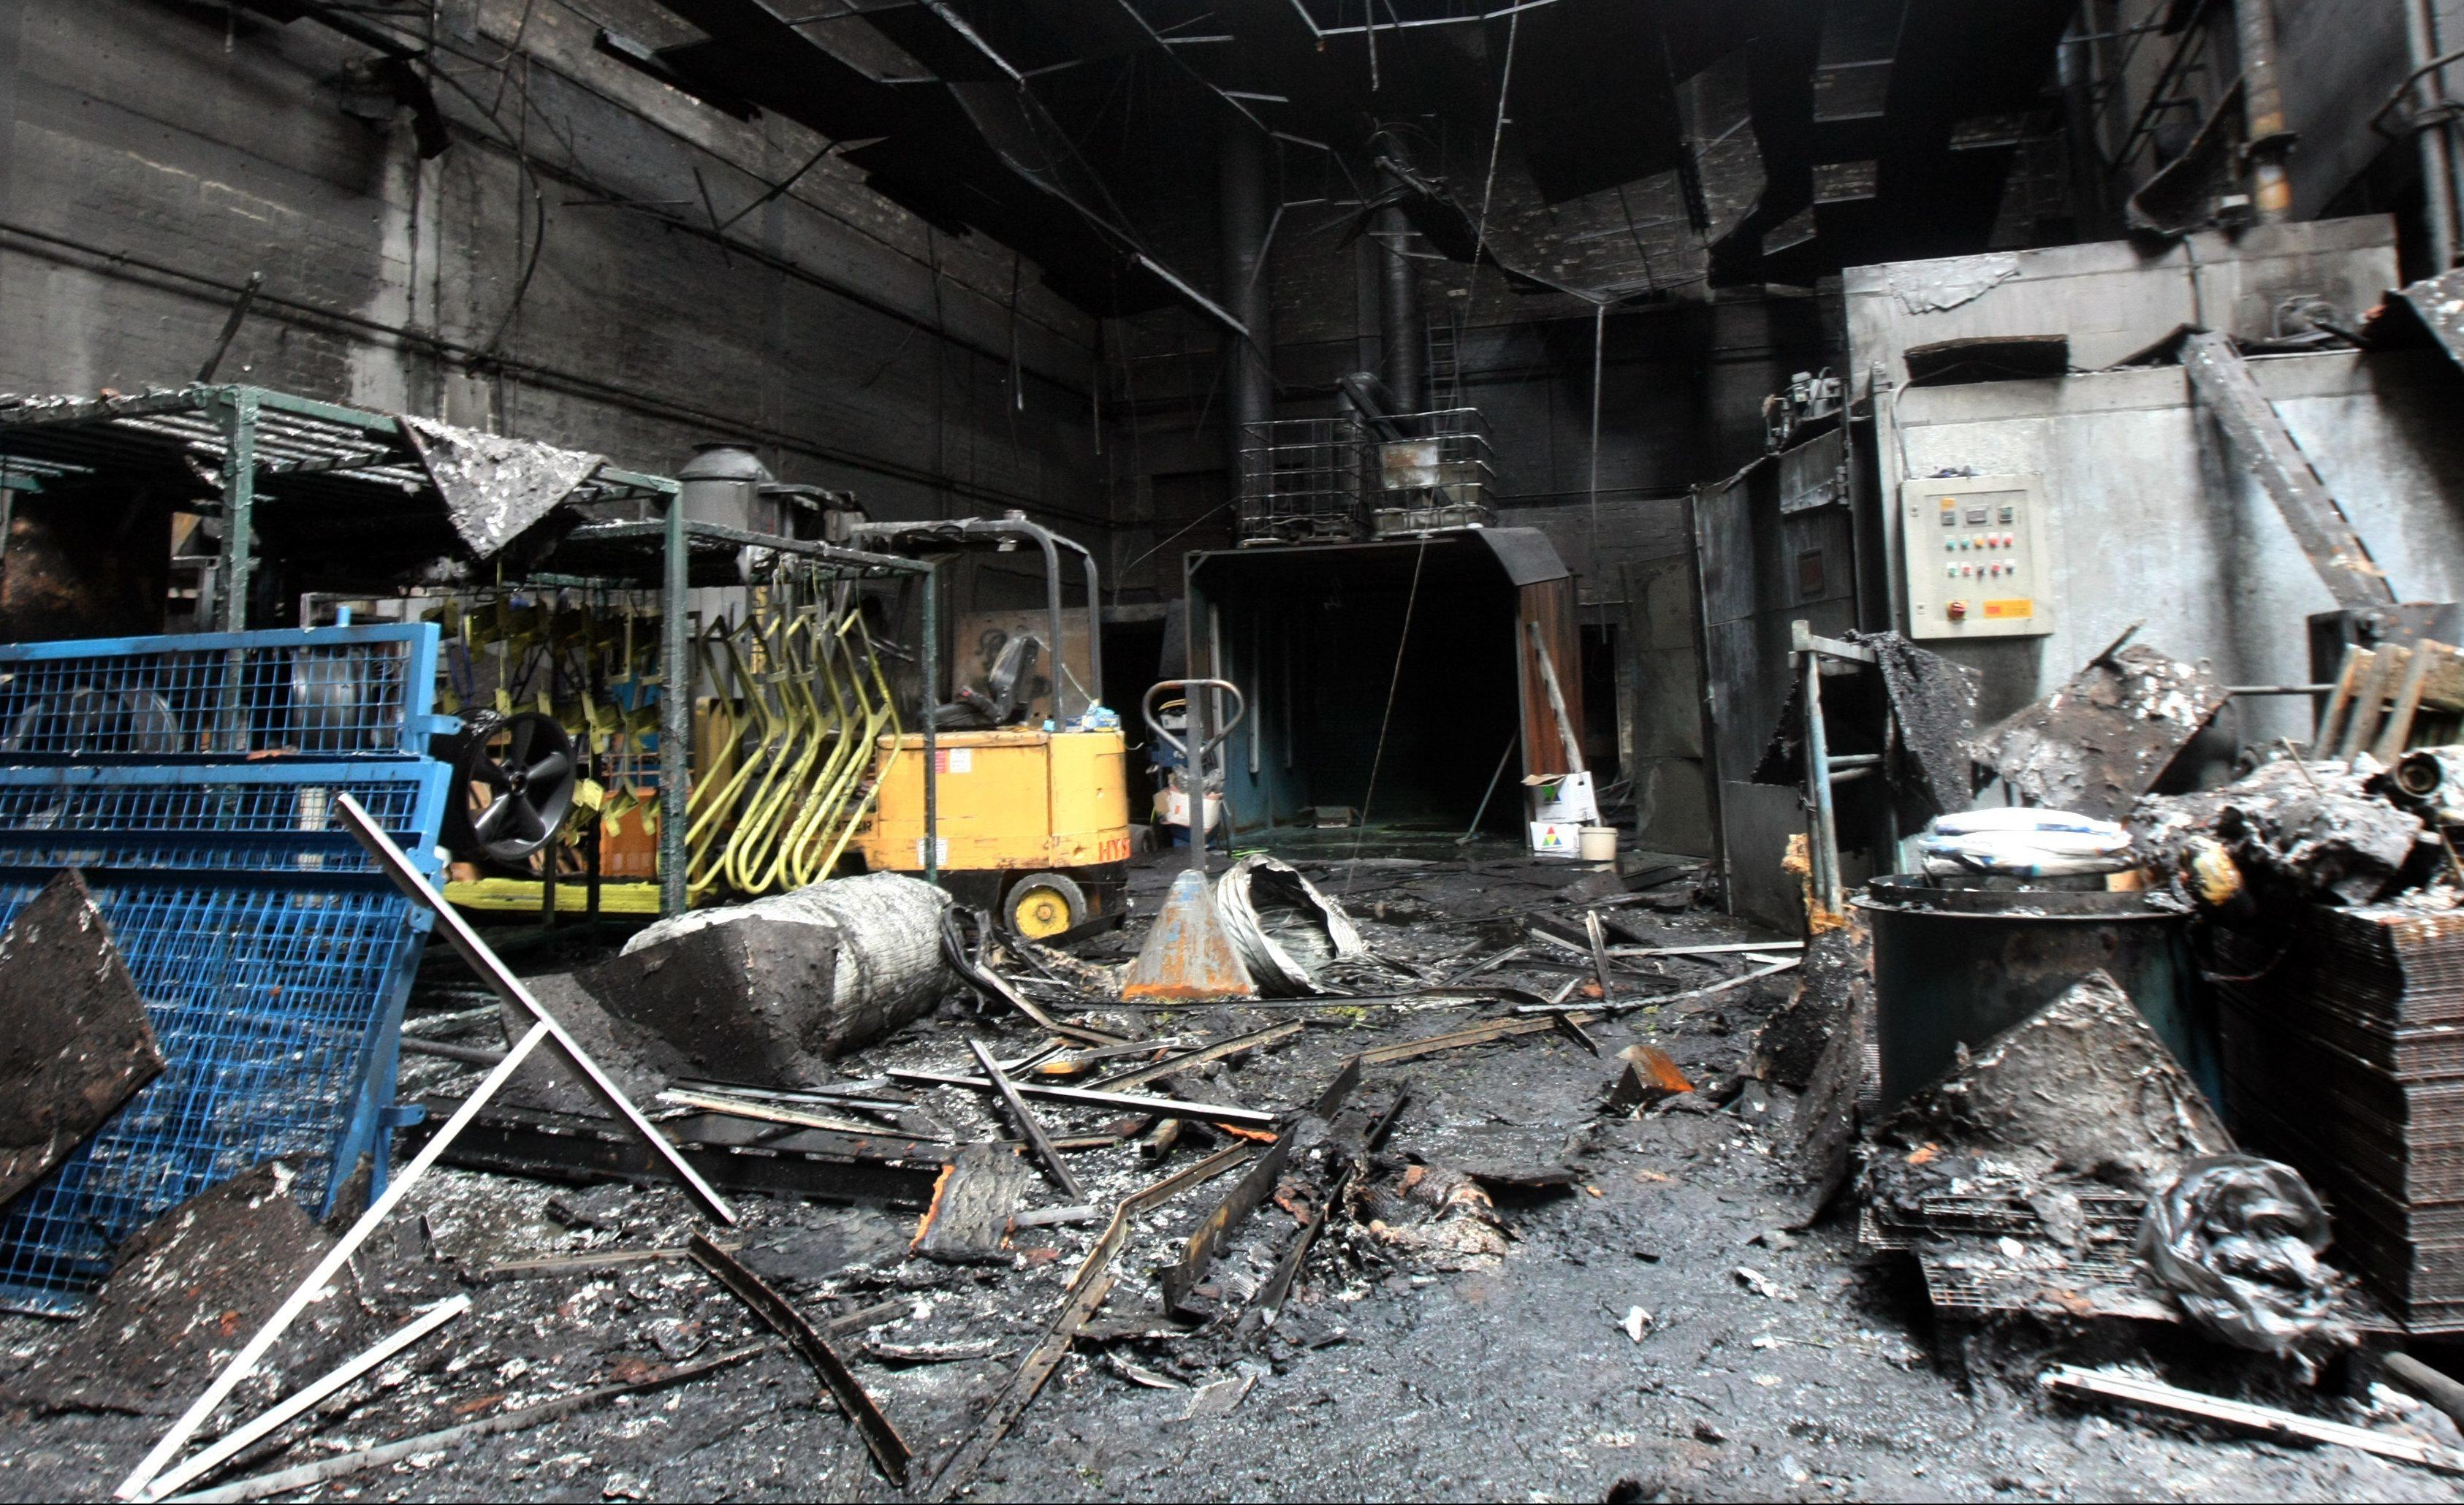 The fire-damaged unit.